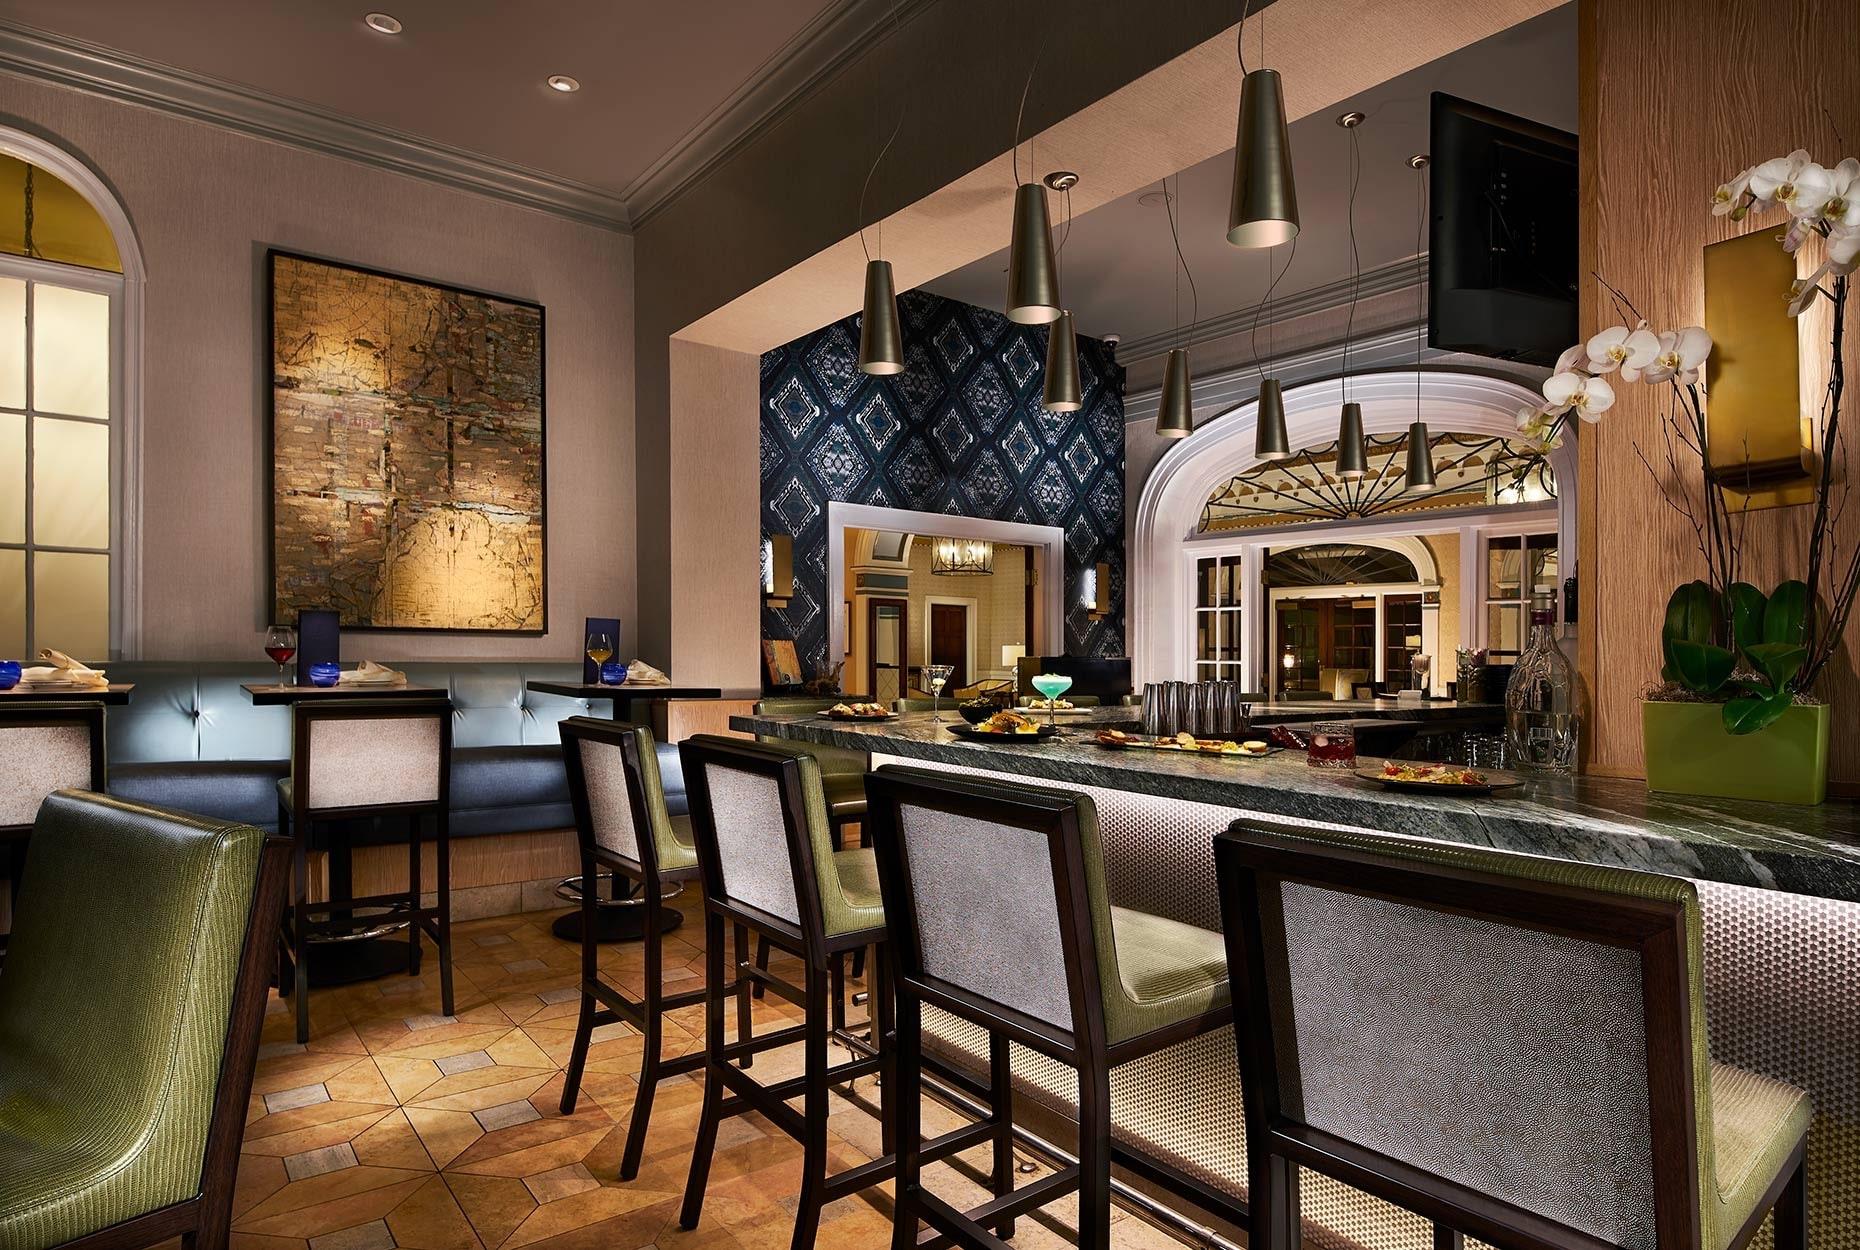 The bar at Nine-Ten at Grande Colonial hotel in La Jolla